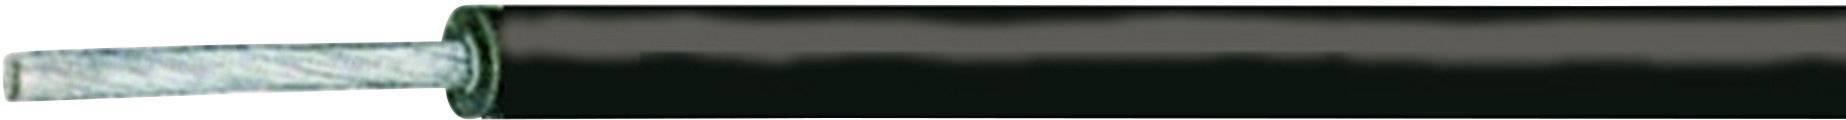 Licna XBK Kabel SiL-SiAF, 1x 1 mm², silikon, Ø 1,30 mm, 1 m, černá